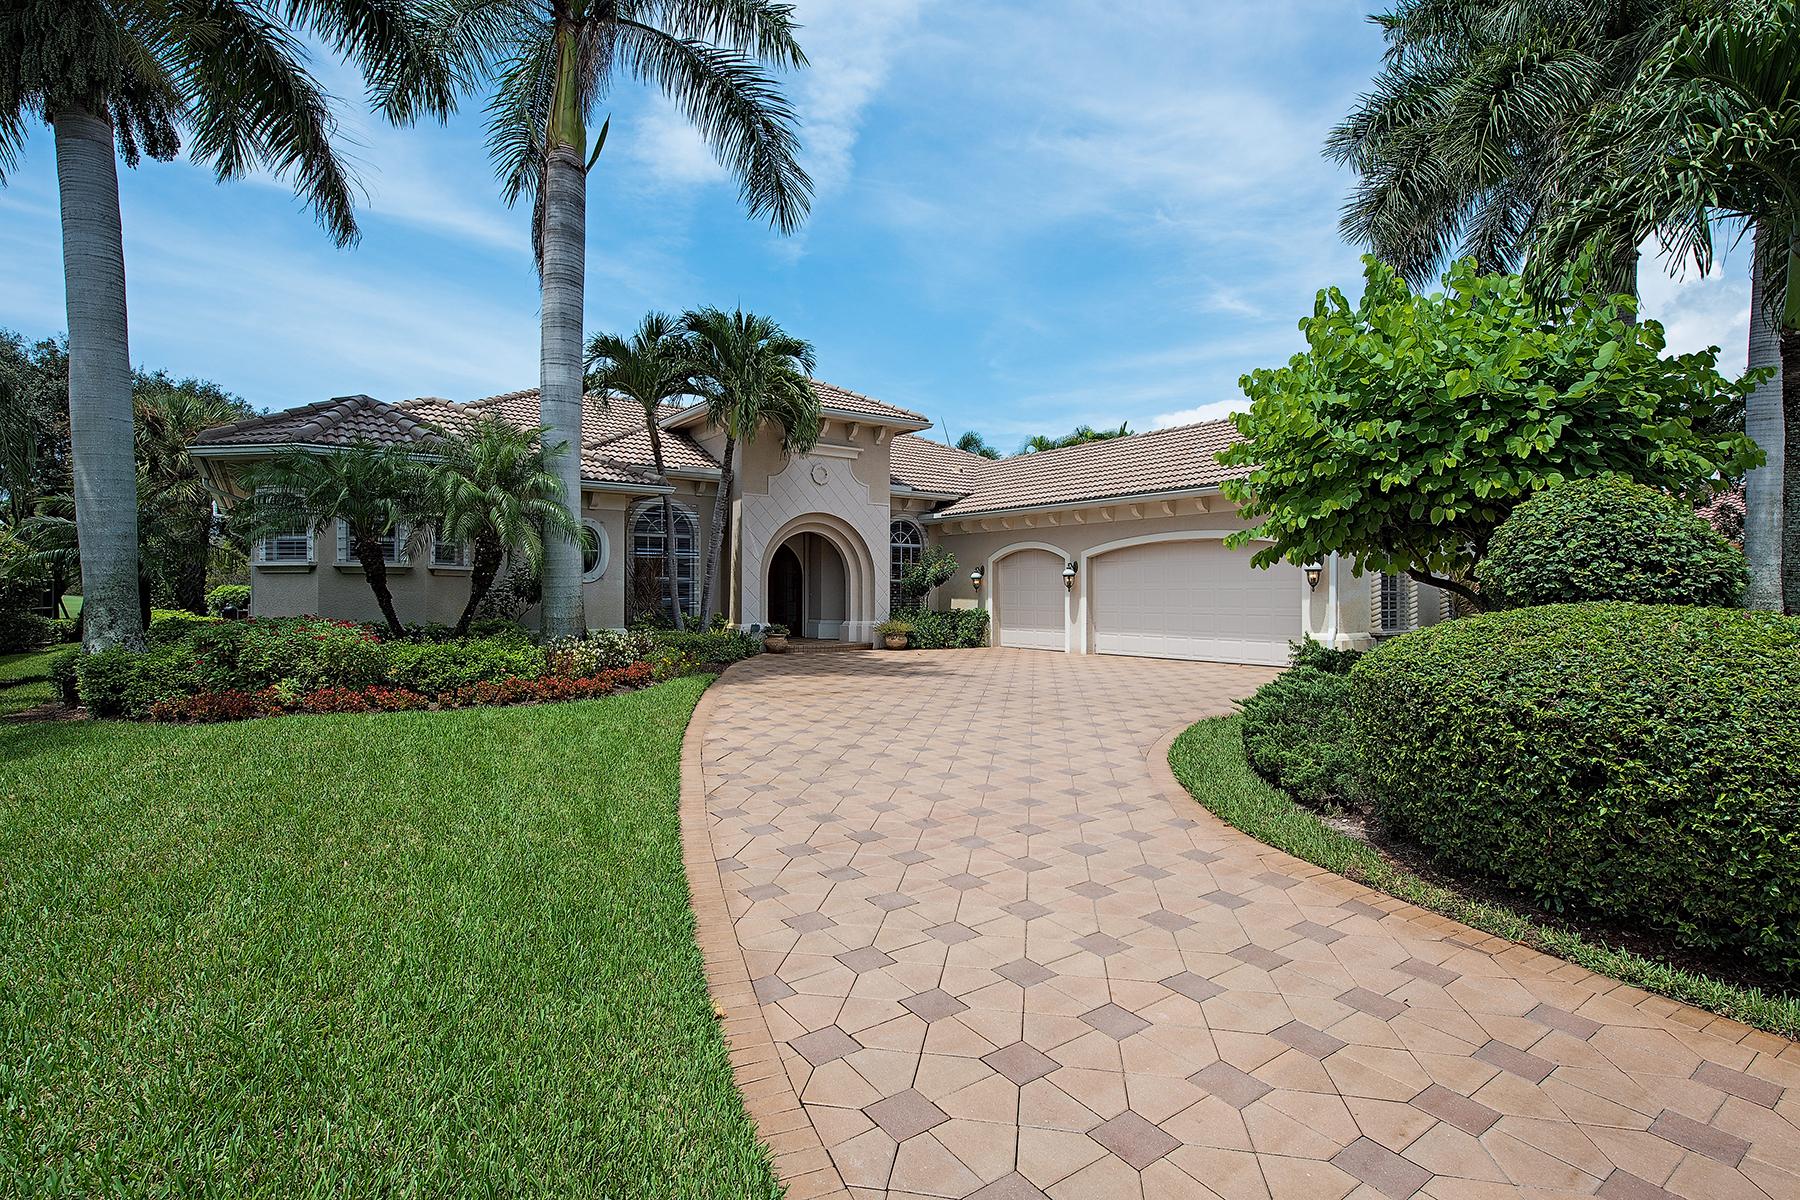 Casa Unifamiliar por un Venta en KENSINGTON - KENSINGTON GARDENS 2983 Gardens Blvd Naples, Florida 34105 Estados Unidos